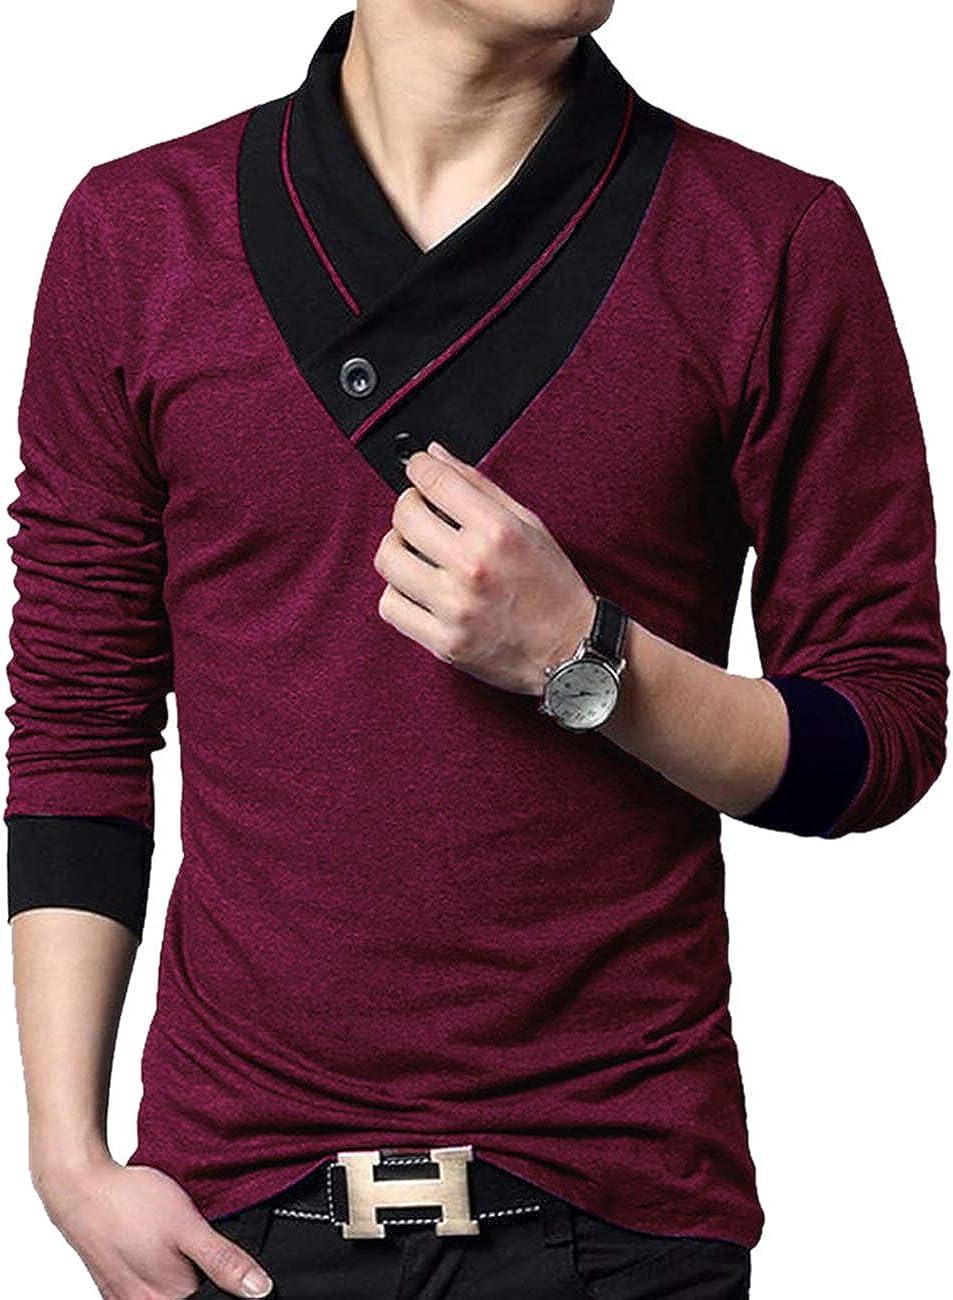 EYEBOGLER V-Neck Shawl Collar Stylish Men's Solid T-Shirt,t shirt for mens india, t shirt for men online, polo t shirts, sport t shirt, black t shirt, blue t shirt, white t shirt,Amazon,